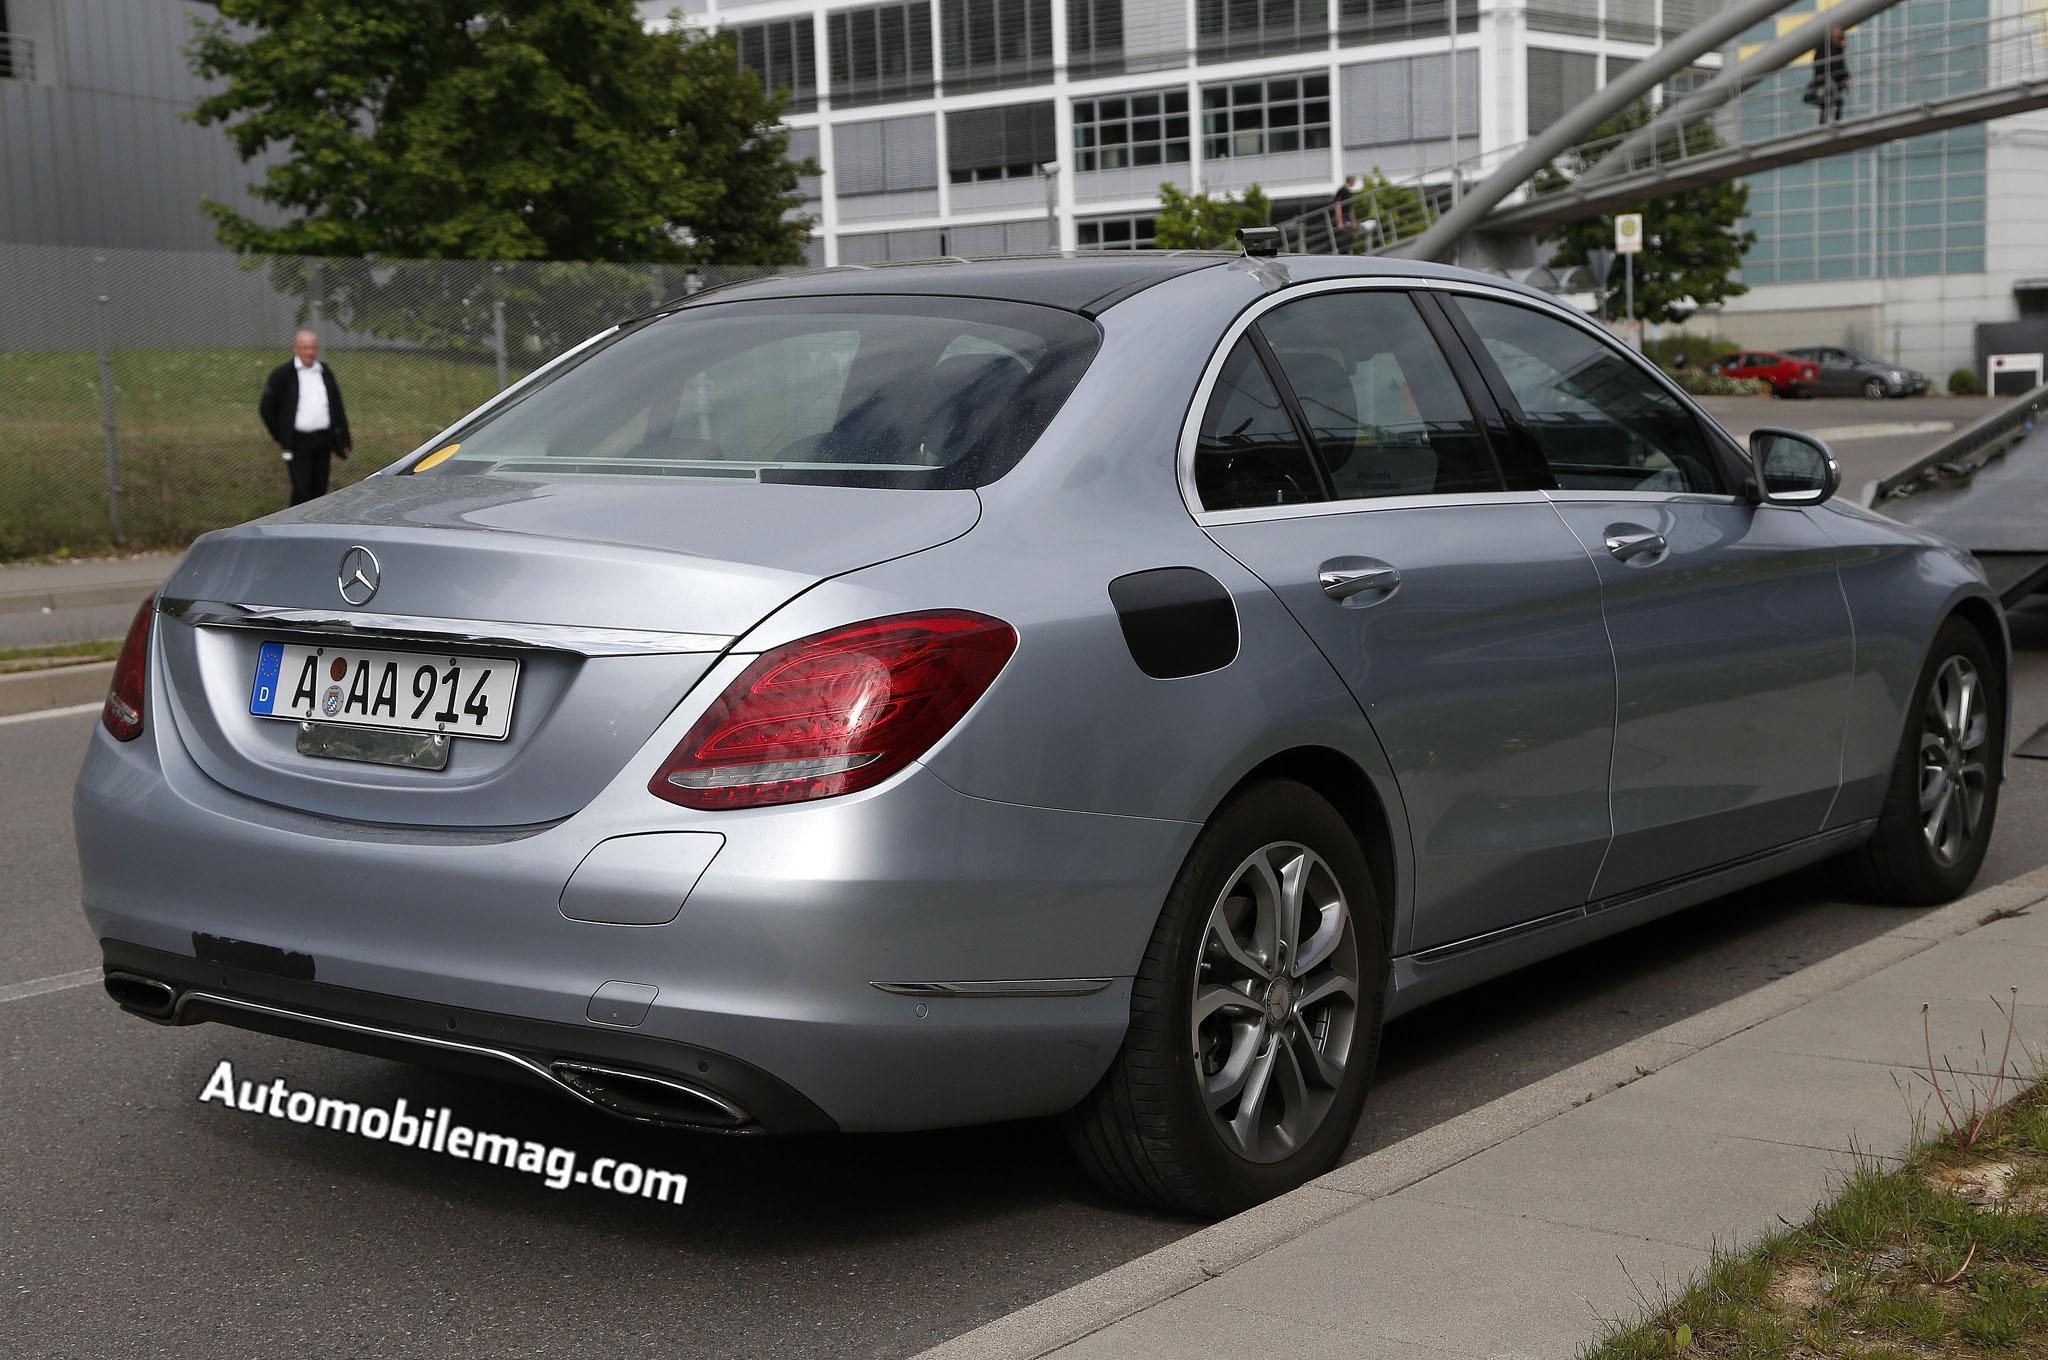 Mercedes Benz C Class Plug In Hybrid Spied